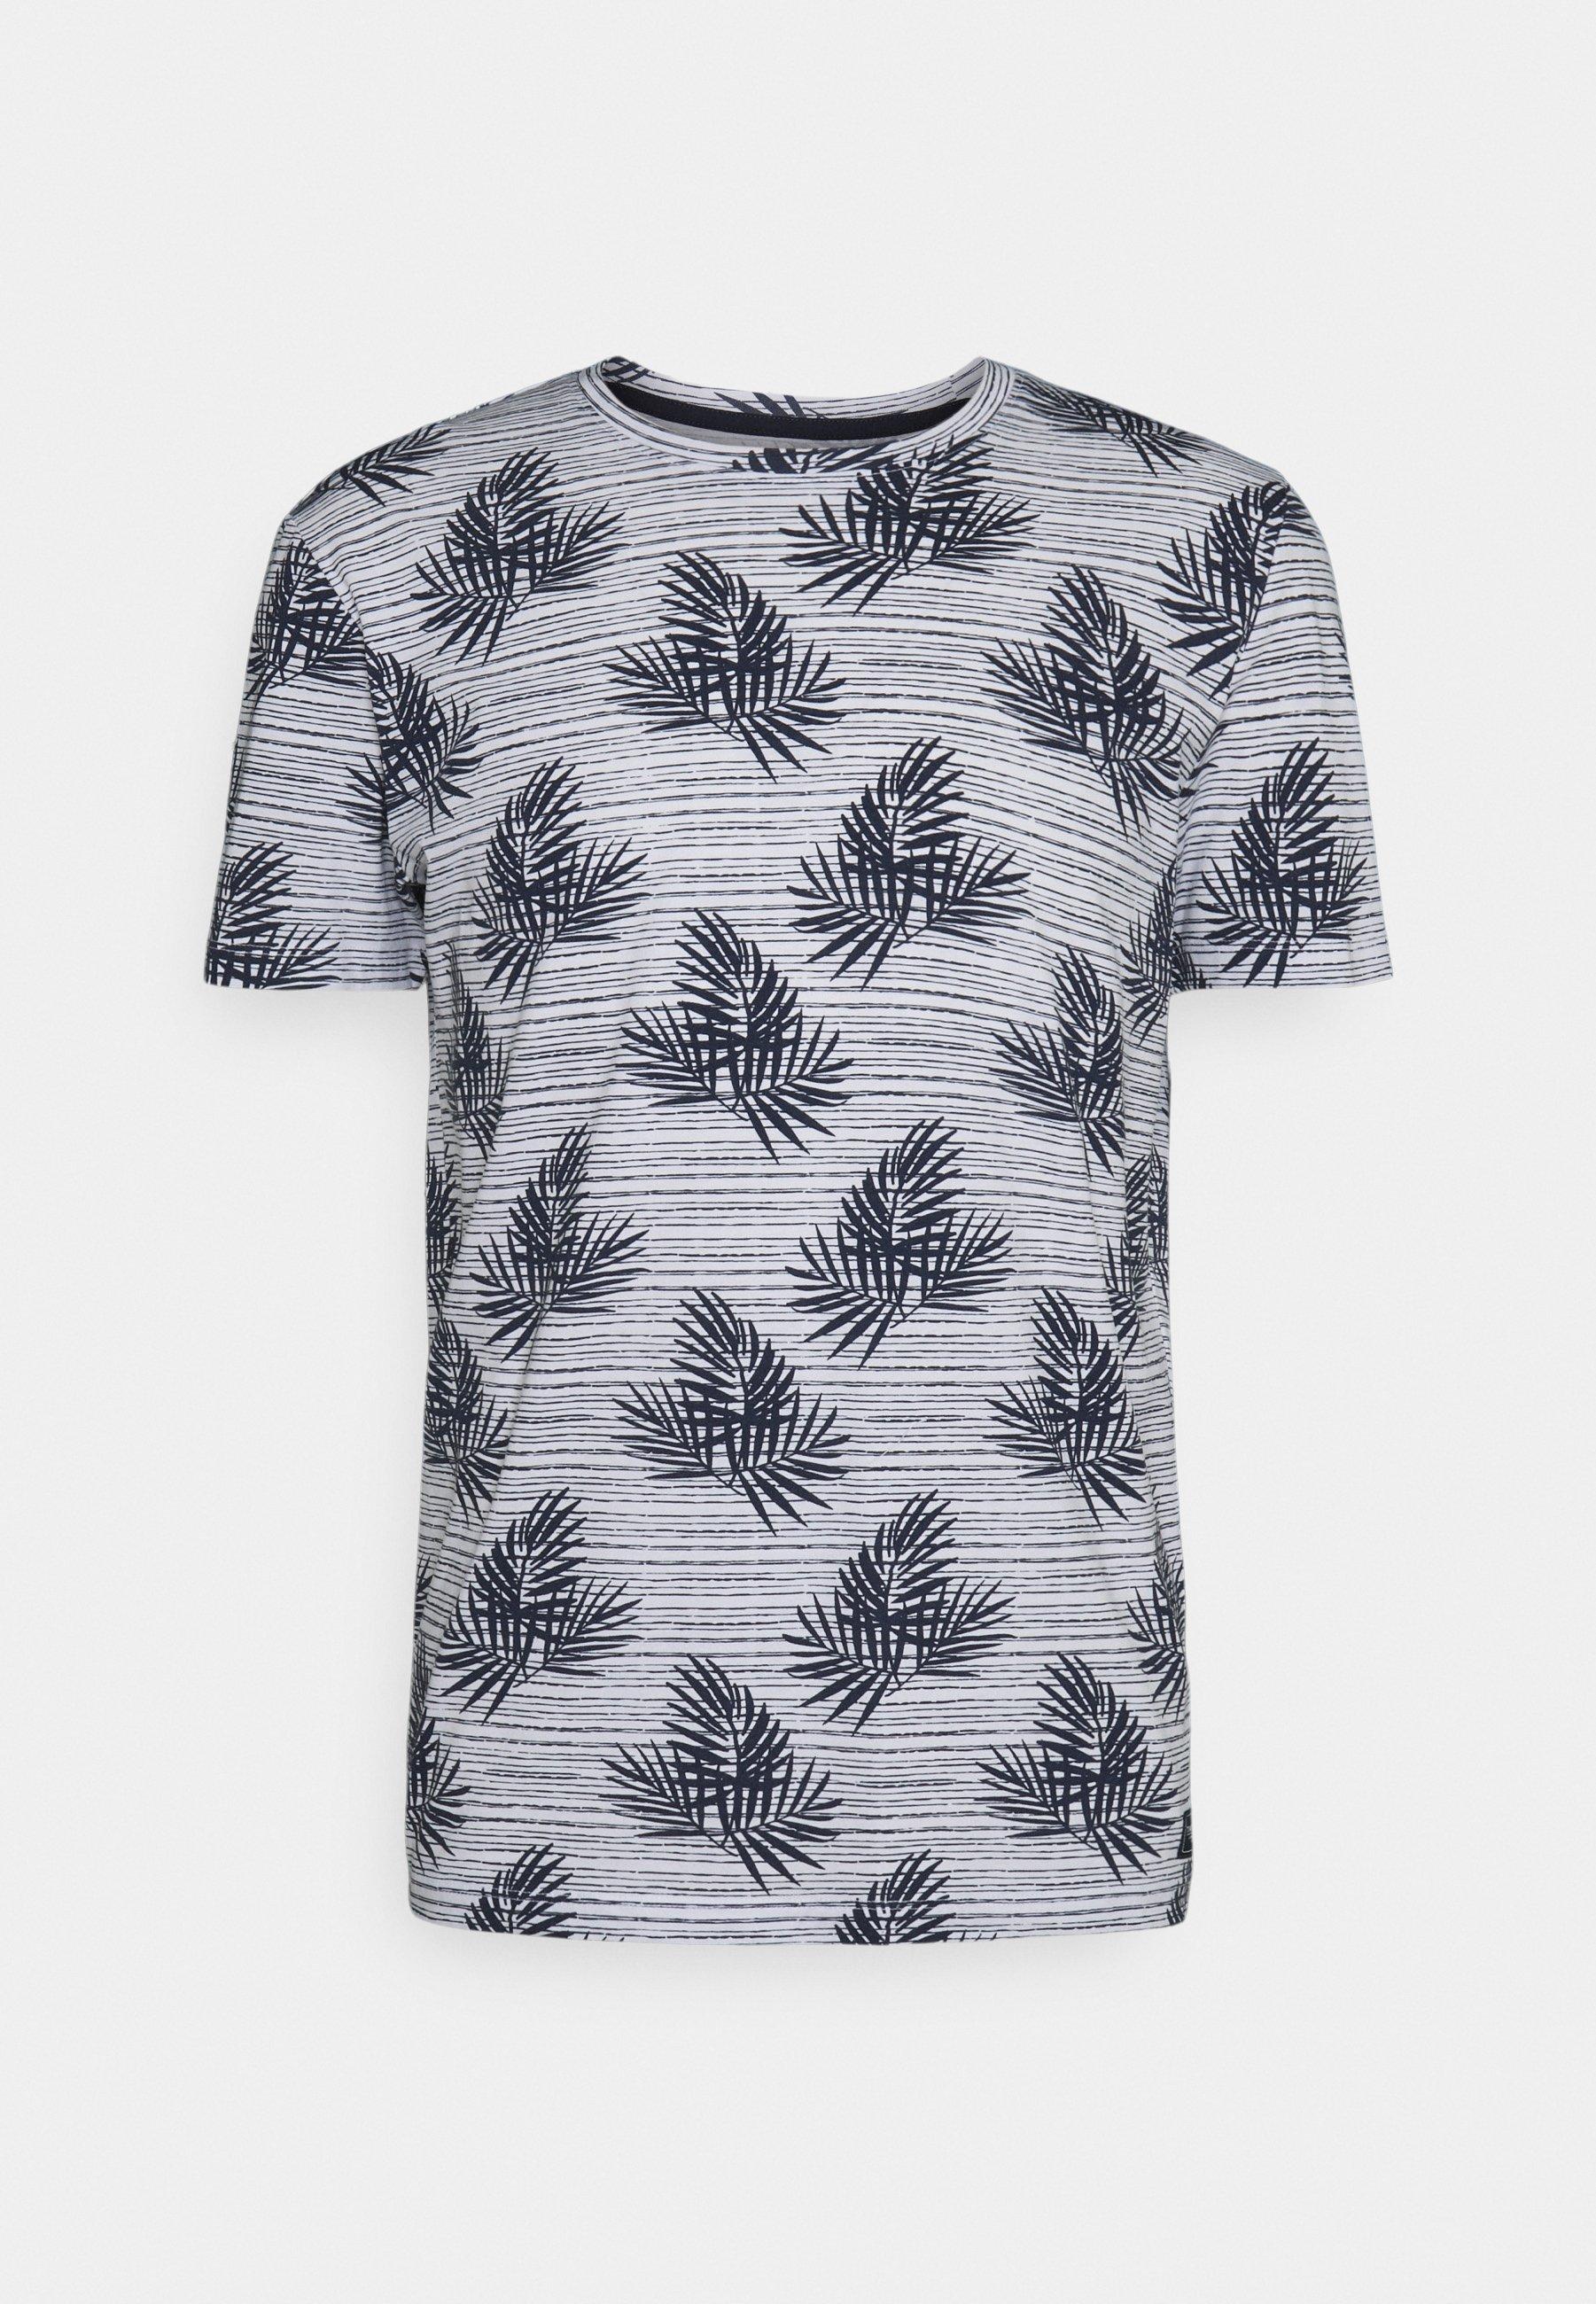 Men SUMMER LEAF PATTERN - Print T-shirt - white/navy